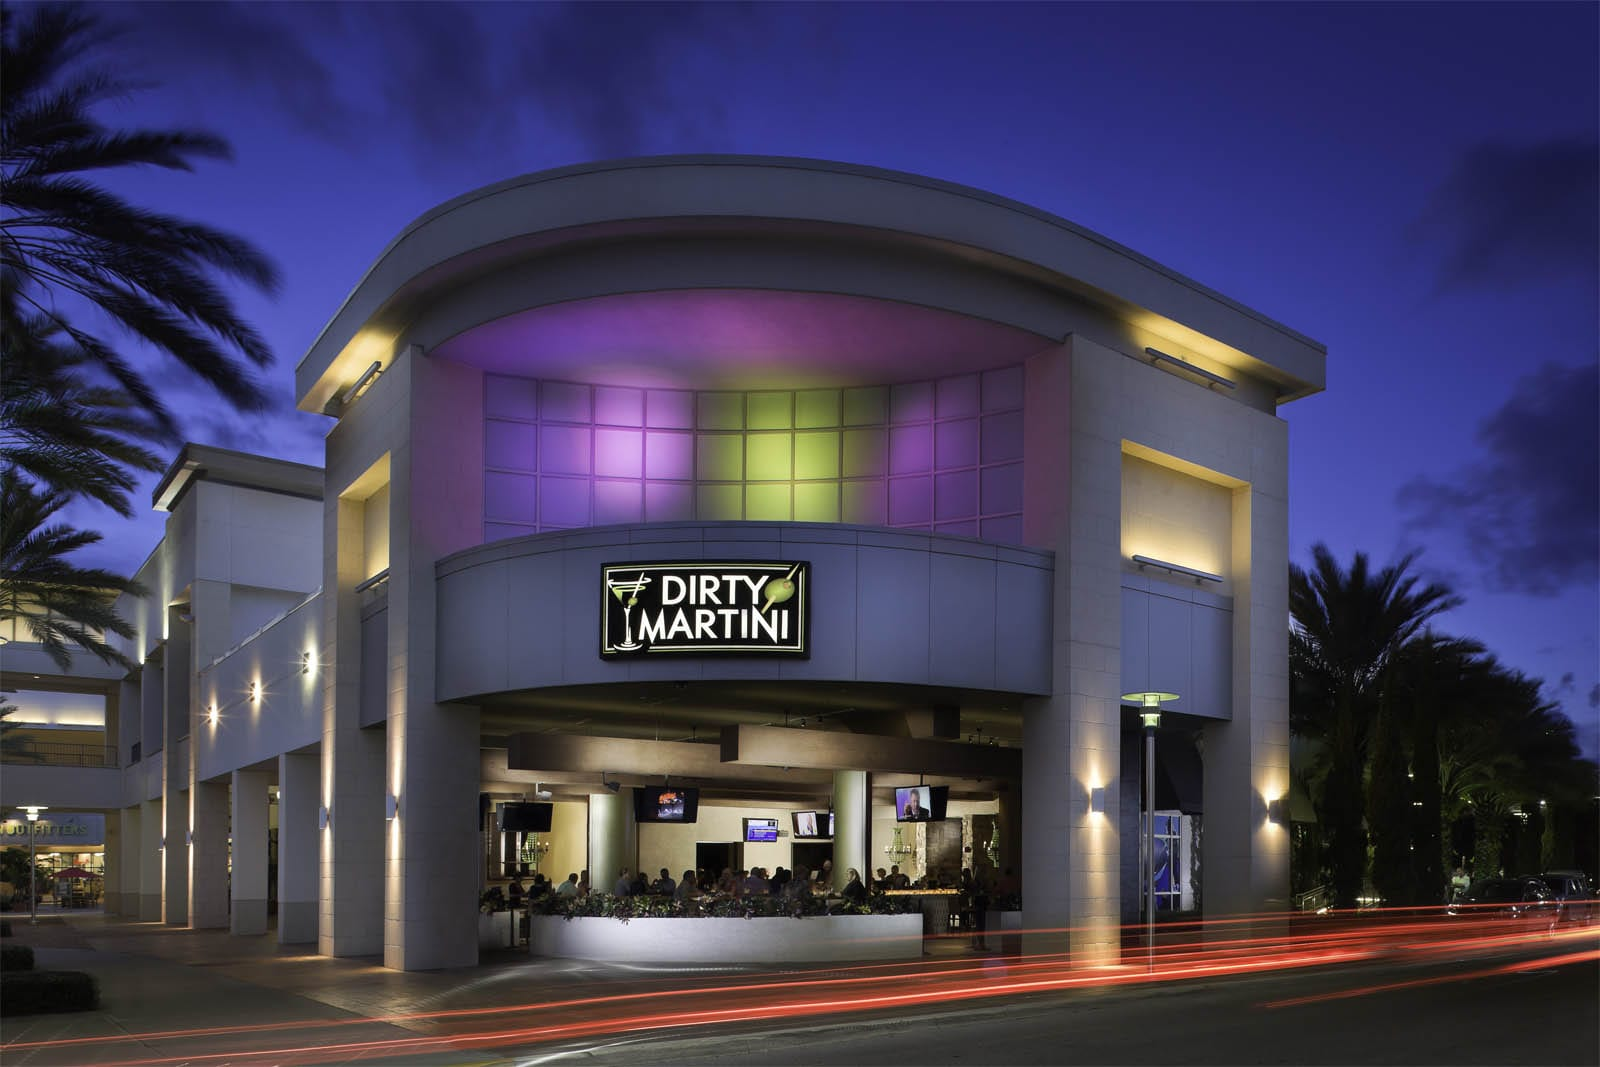 Dirty Martini  Hotel Restaurant  Nightclub Design by Big Time Design Studios